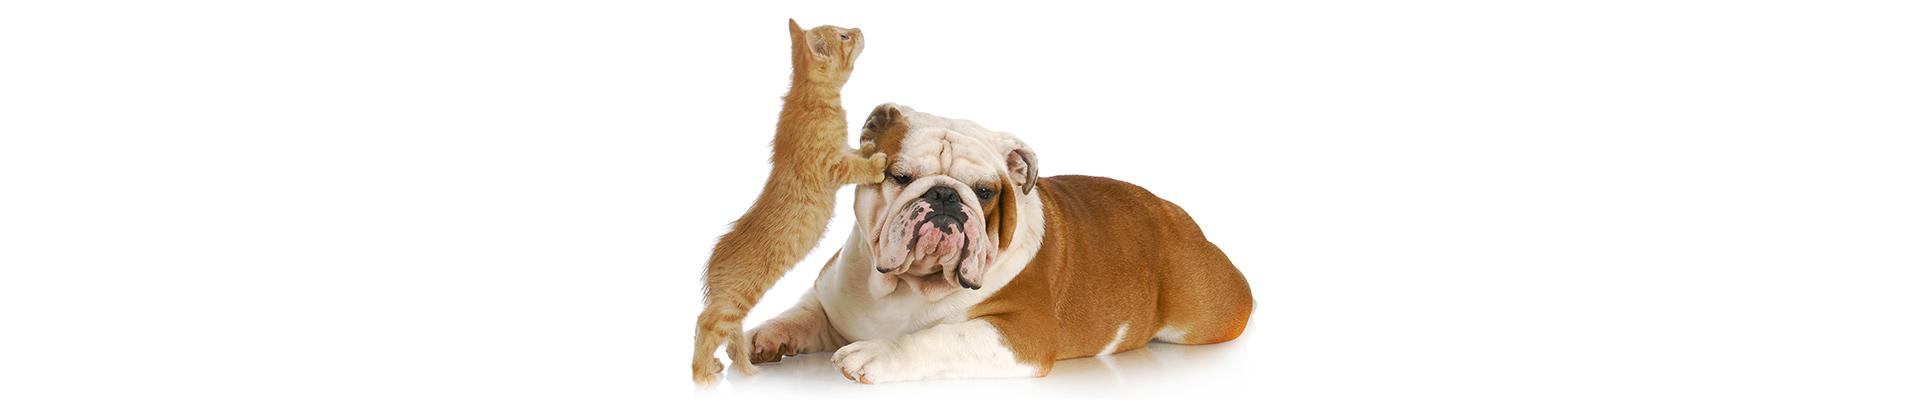 Kitten playing with unamused Bulldog